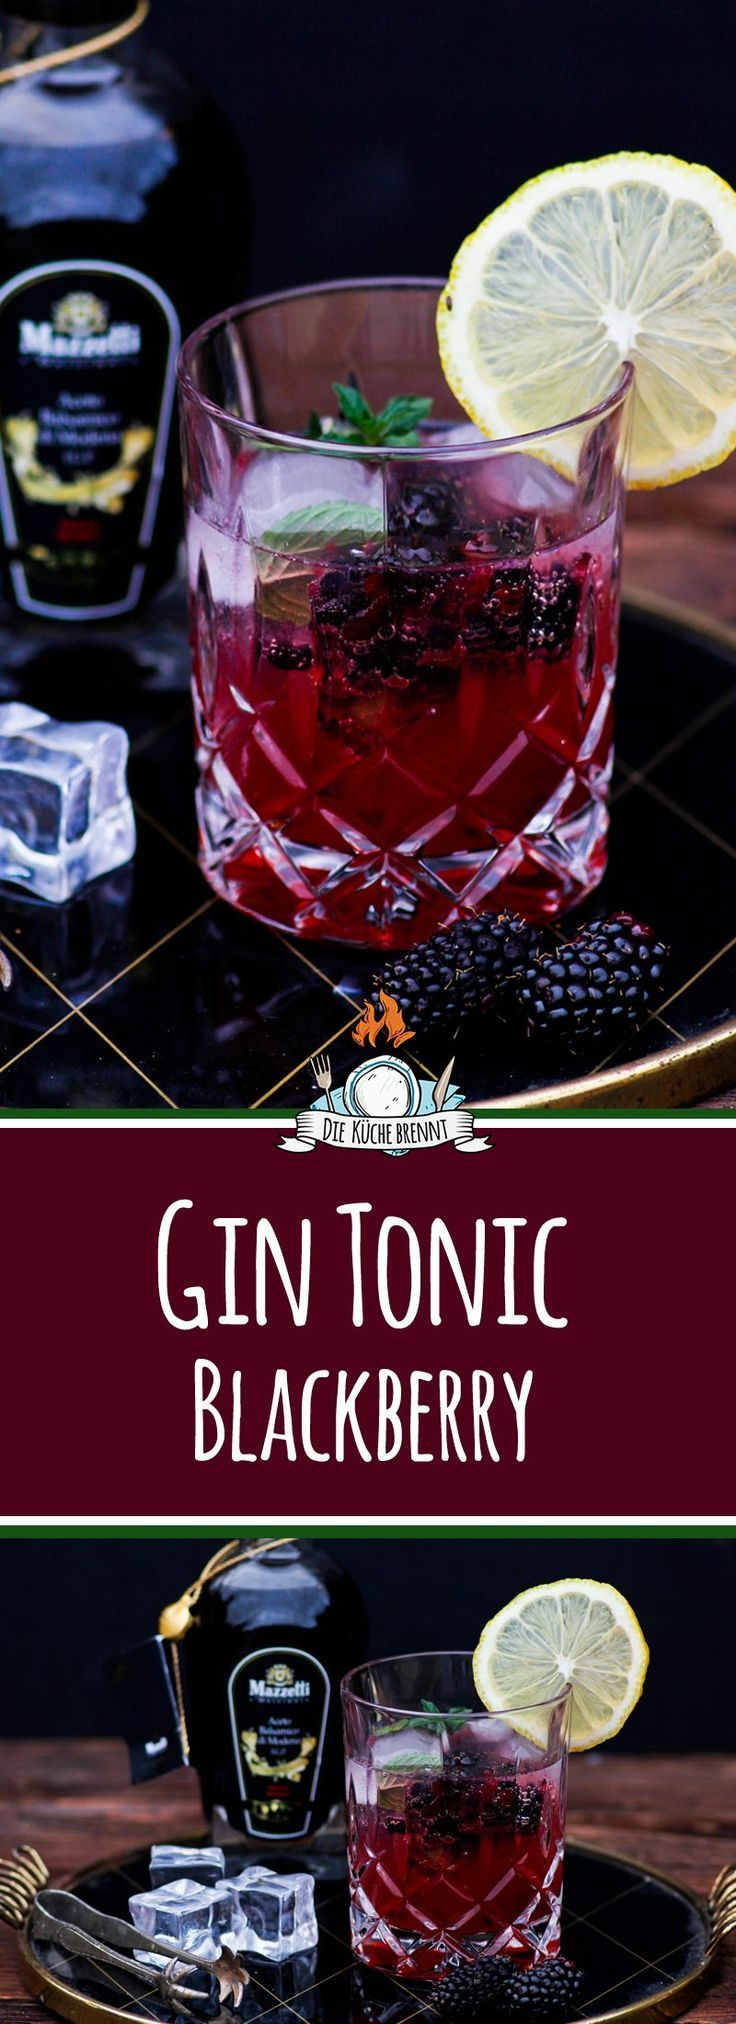 gin tonic blackberry lemon mit mazzetti l originale. Black Bedroom Furniture Sets. Home Design Ideas